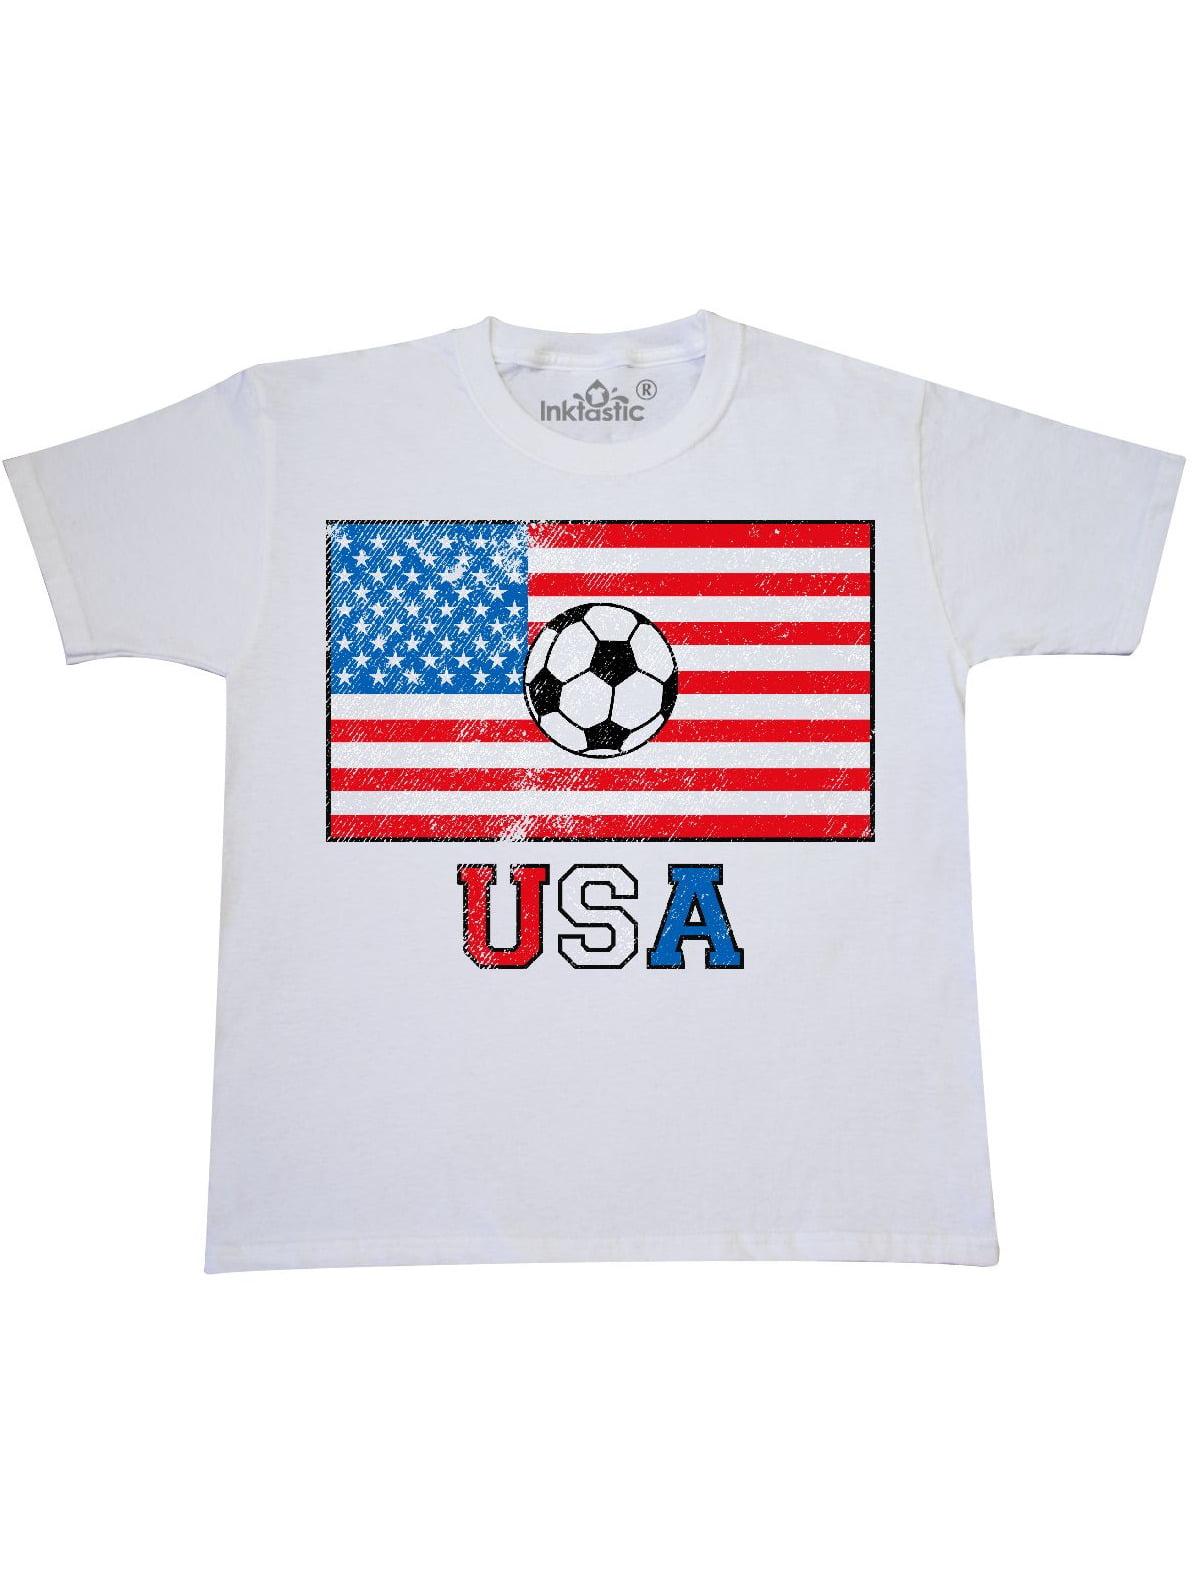 Inktastic USA Soccer Toddler T-Shirt American America United States Futbol Fan